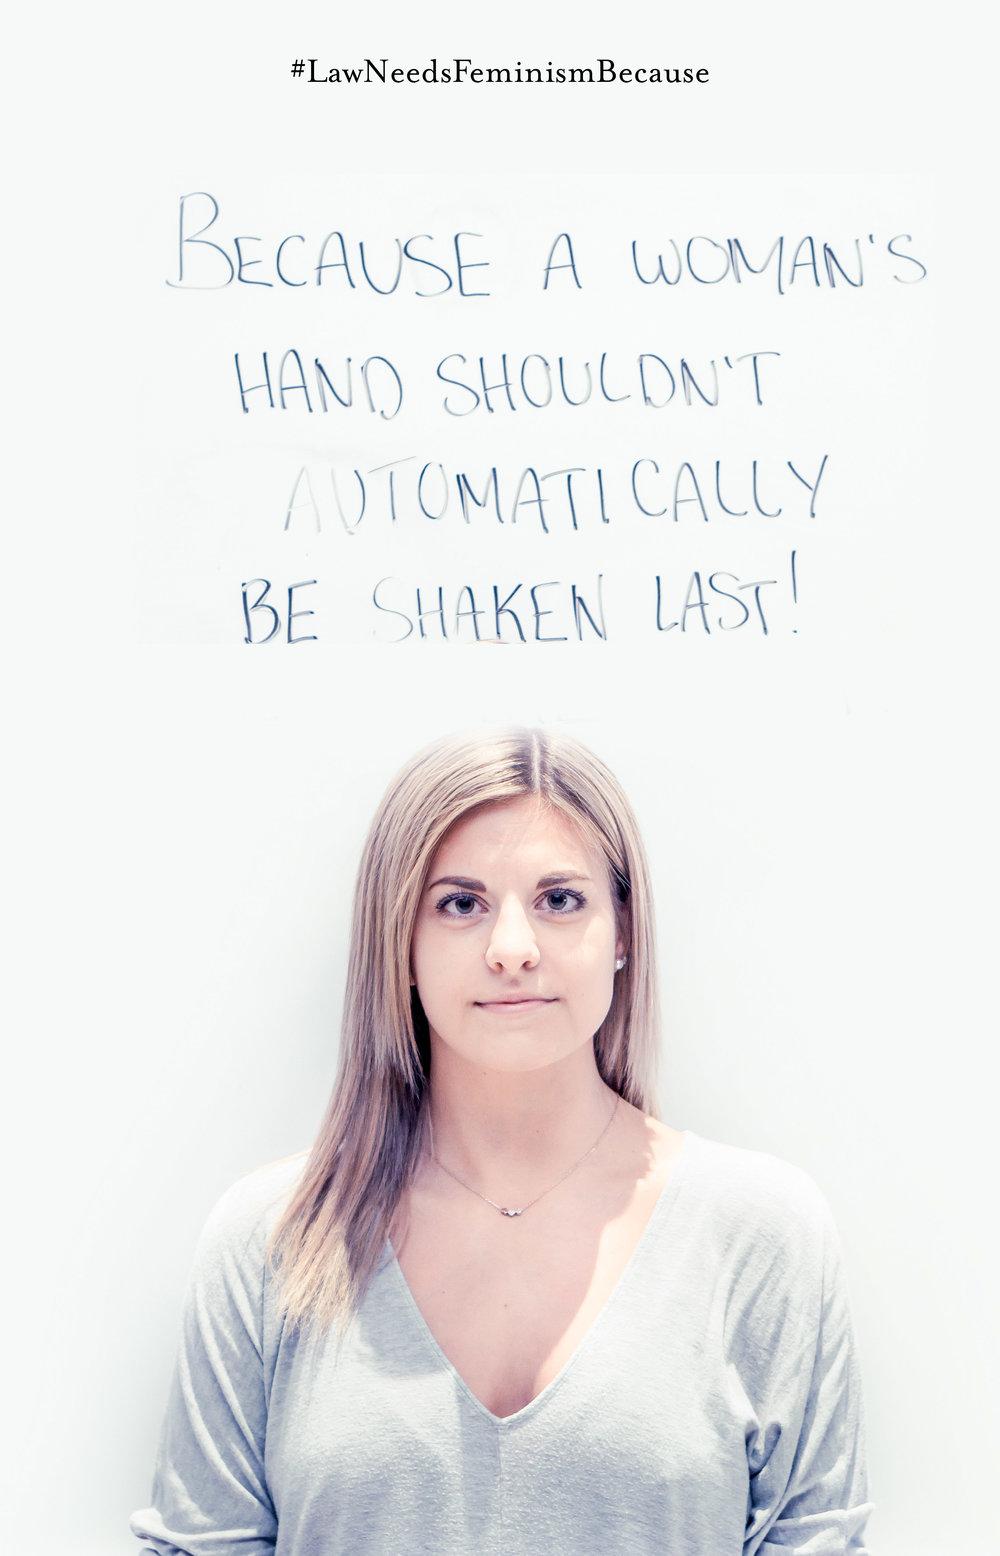 #LawNeedsFeminismBecause-7.jpg